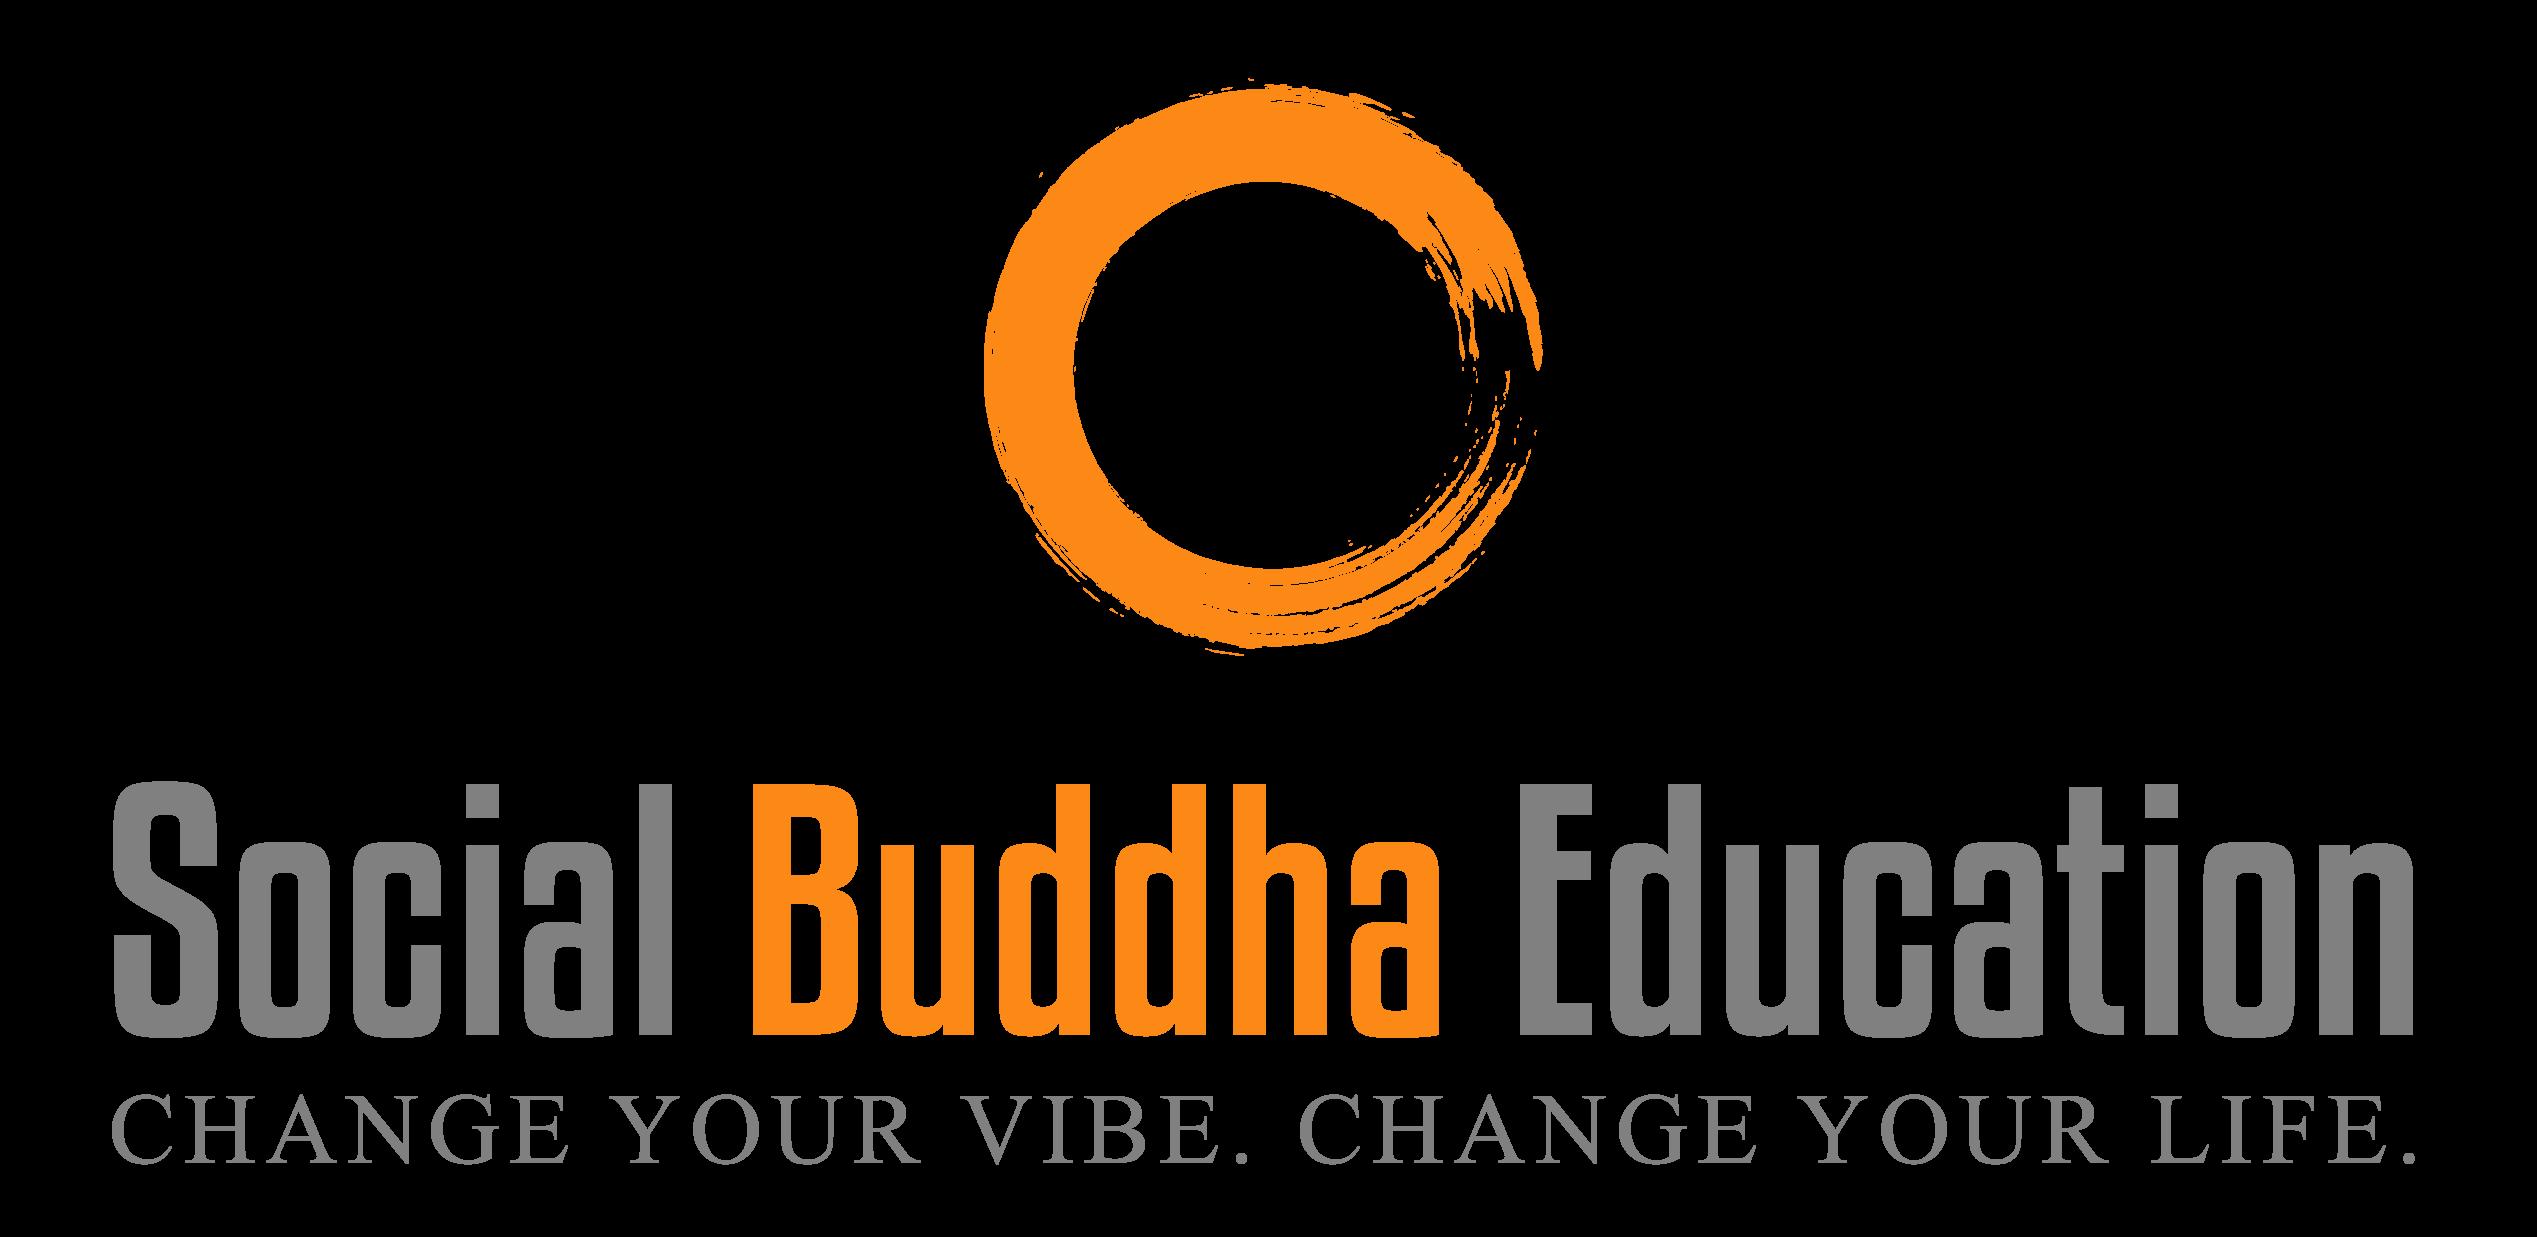 Social Buddha